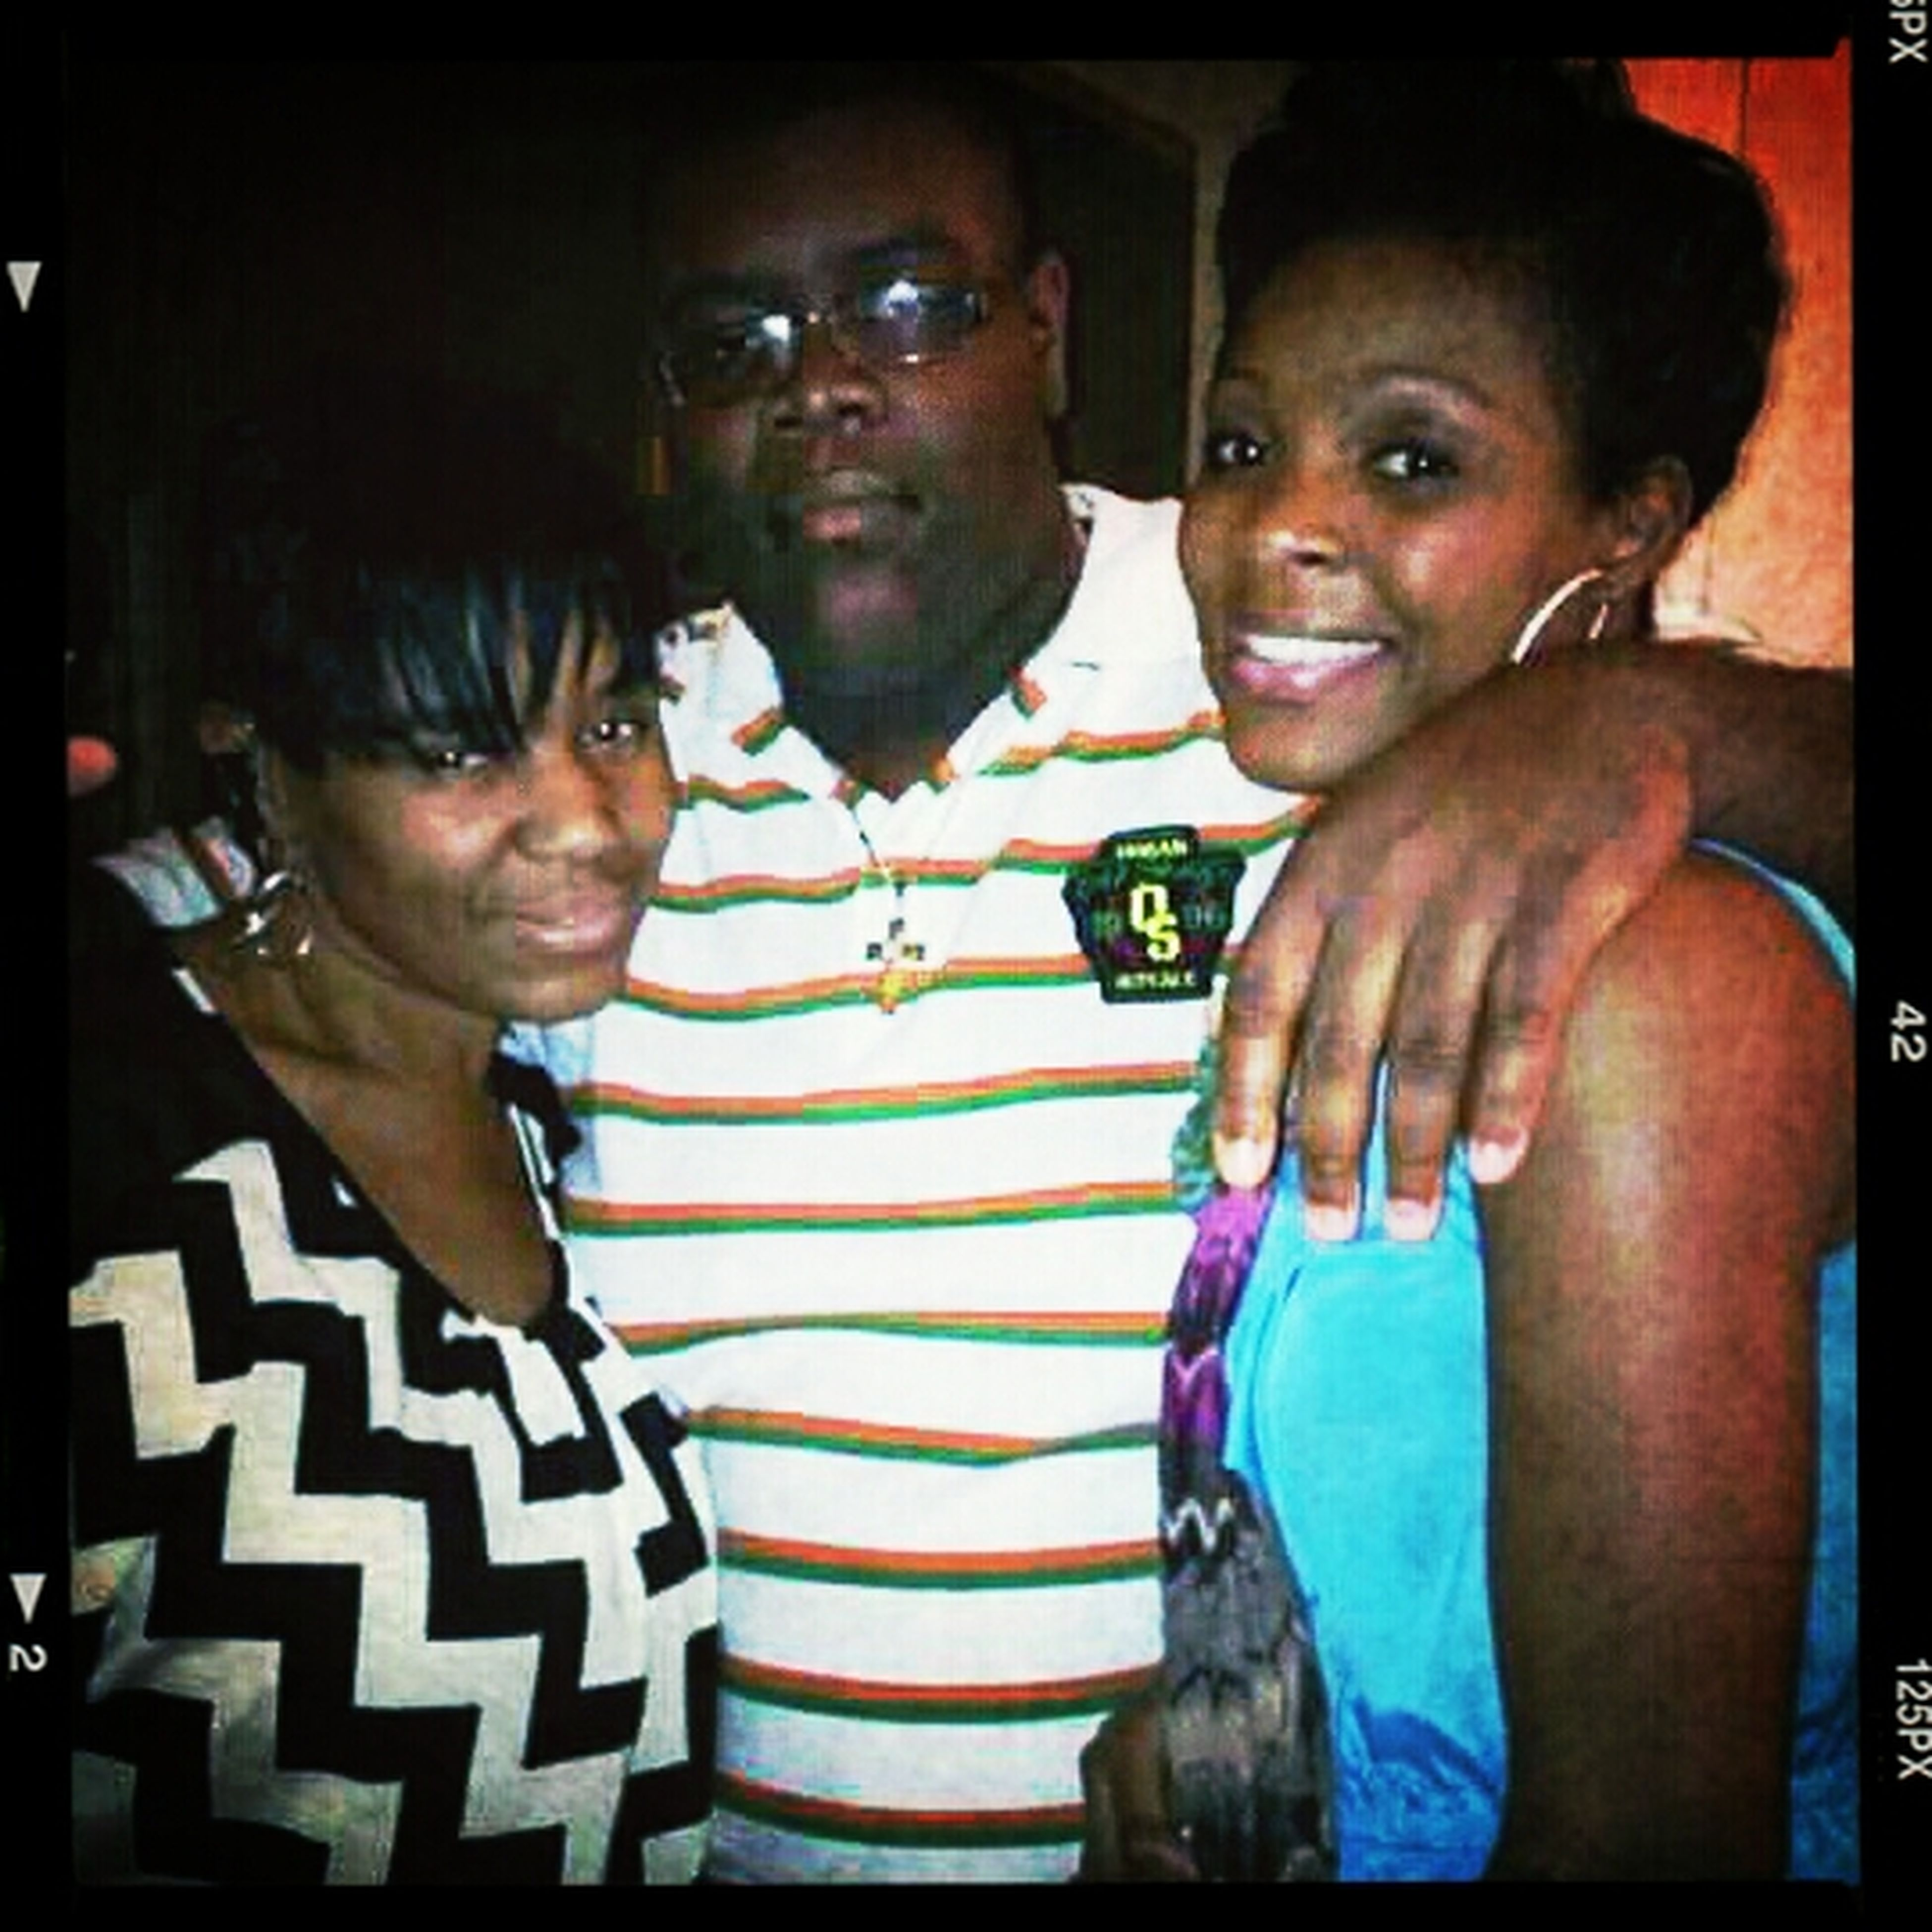 Aint Nothin Lyk Family